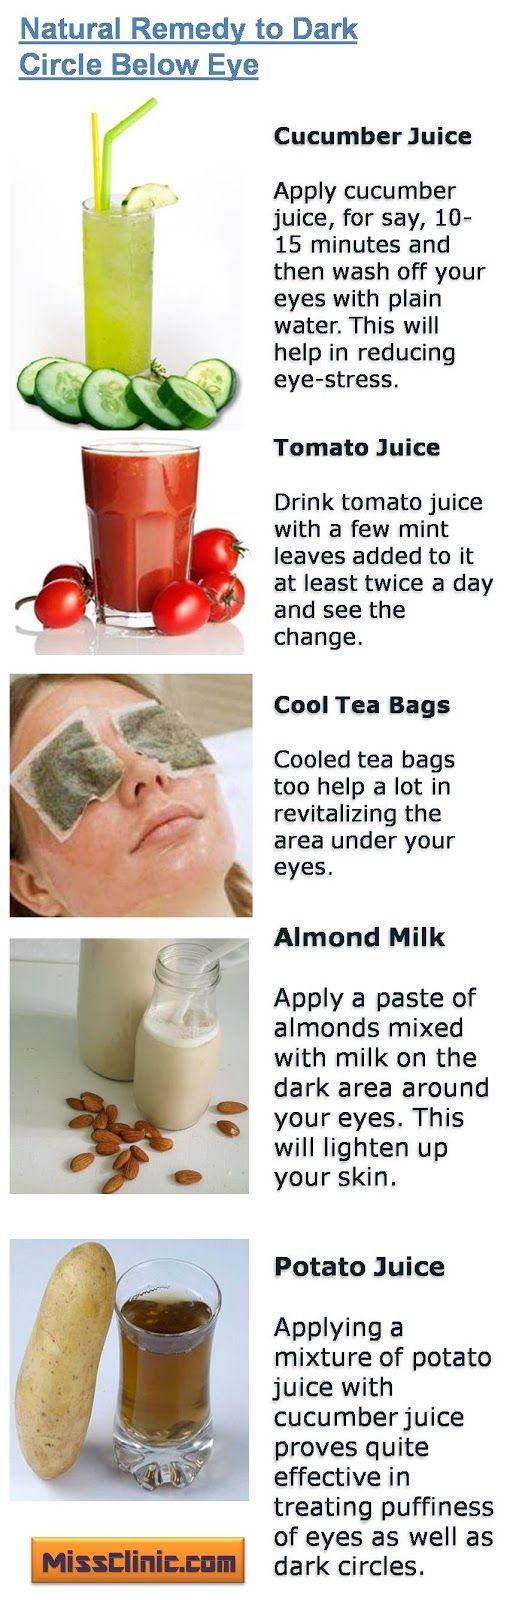 5 #Home #Remedies to Dark Circle under Eyes